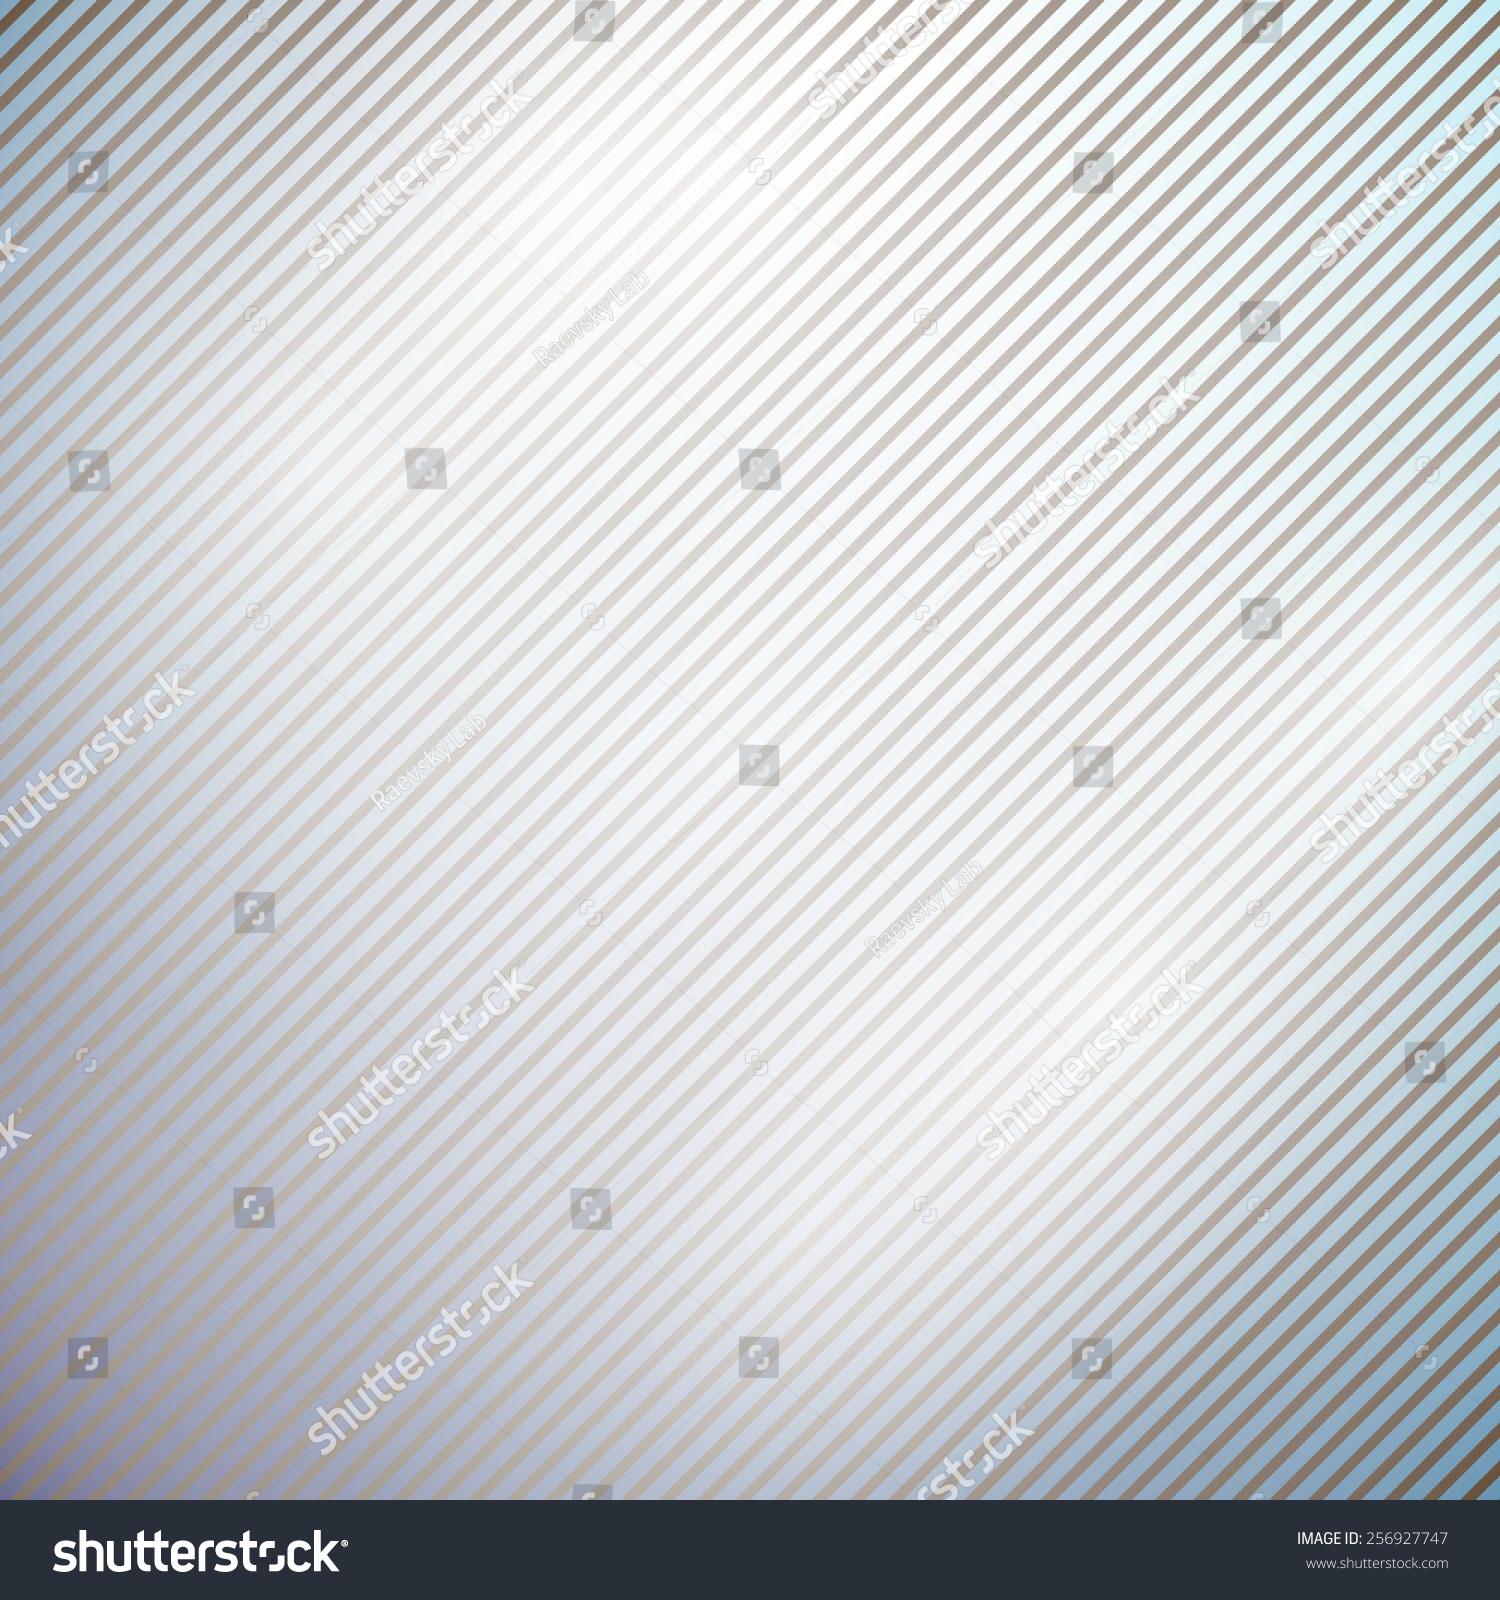 Line Texture Vector : Diagonal line pattern vector